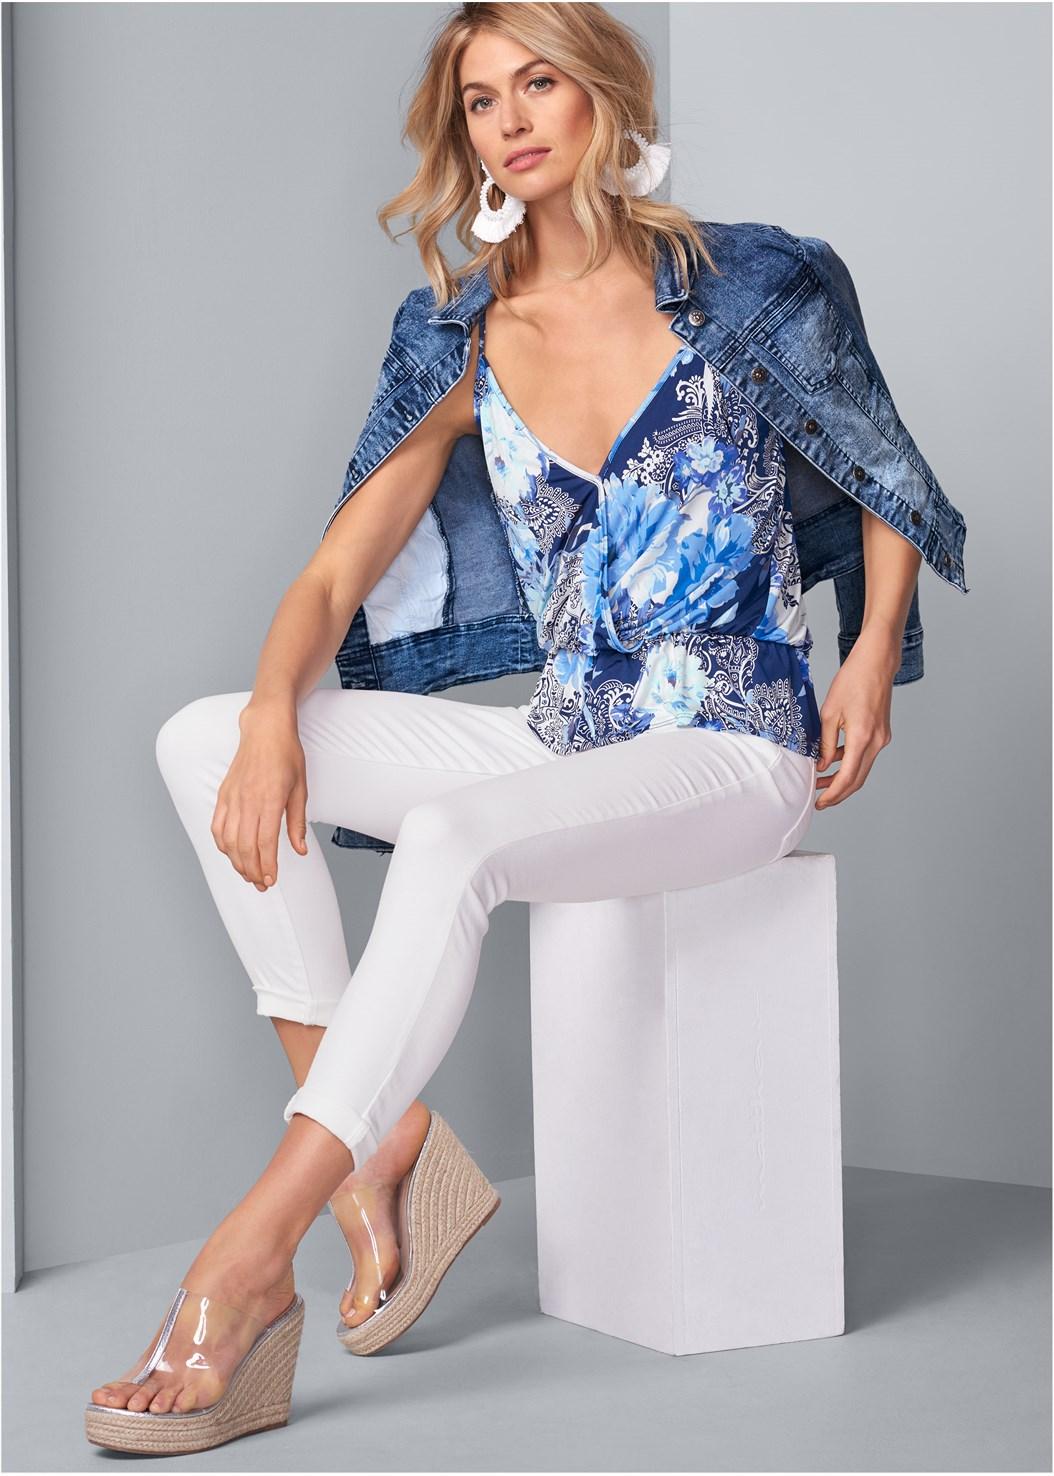 Surplice Paisley Top,Jean Jacket,Color Skinny Jeans